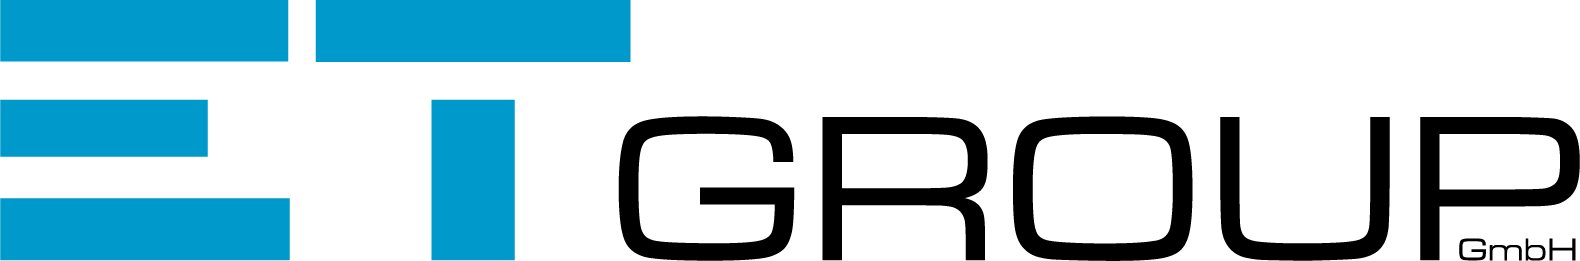 ET Group GmbH